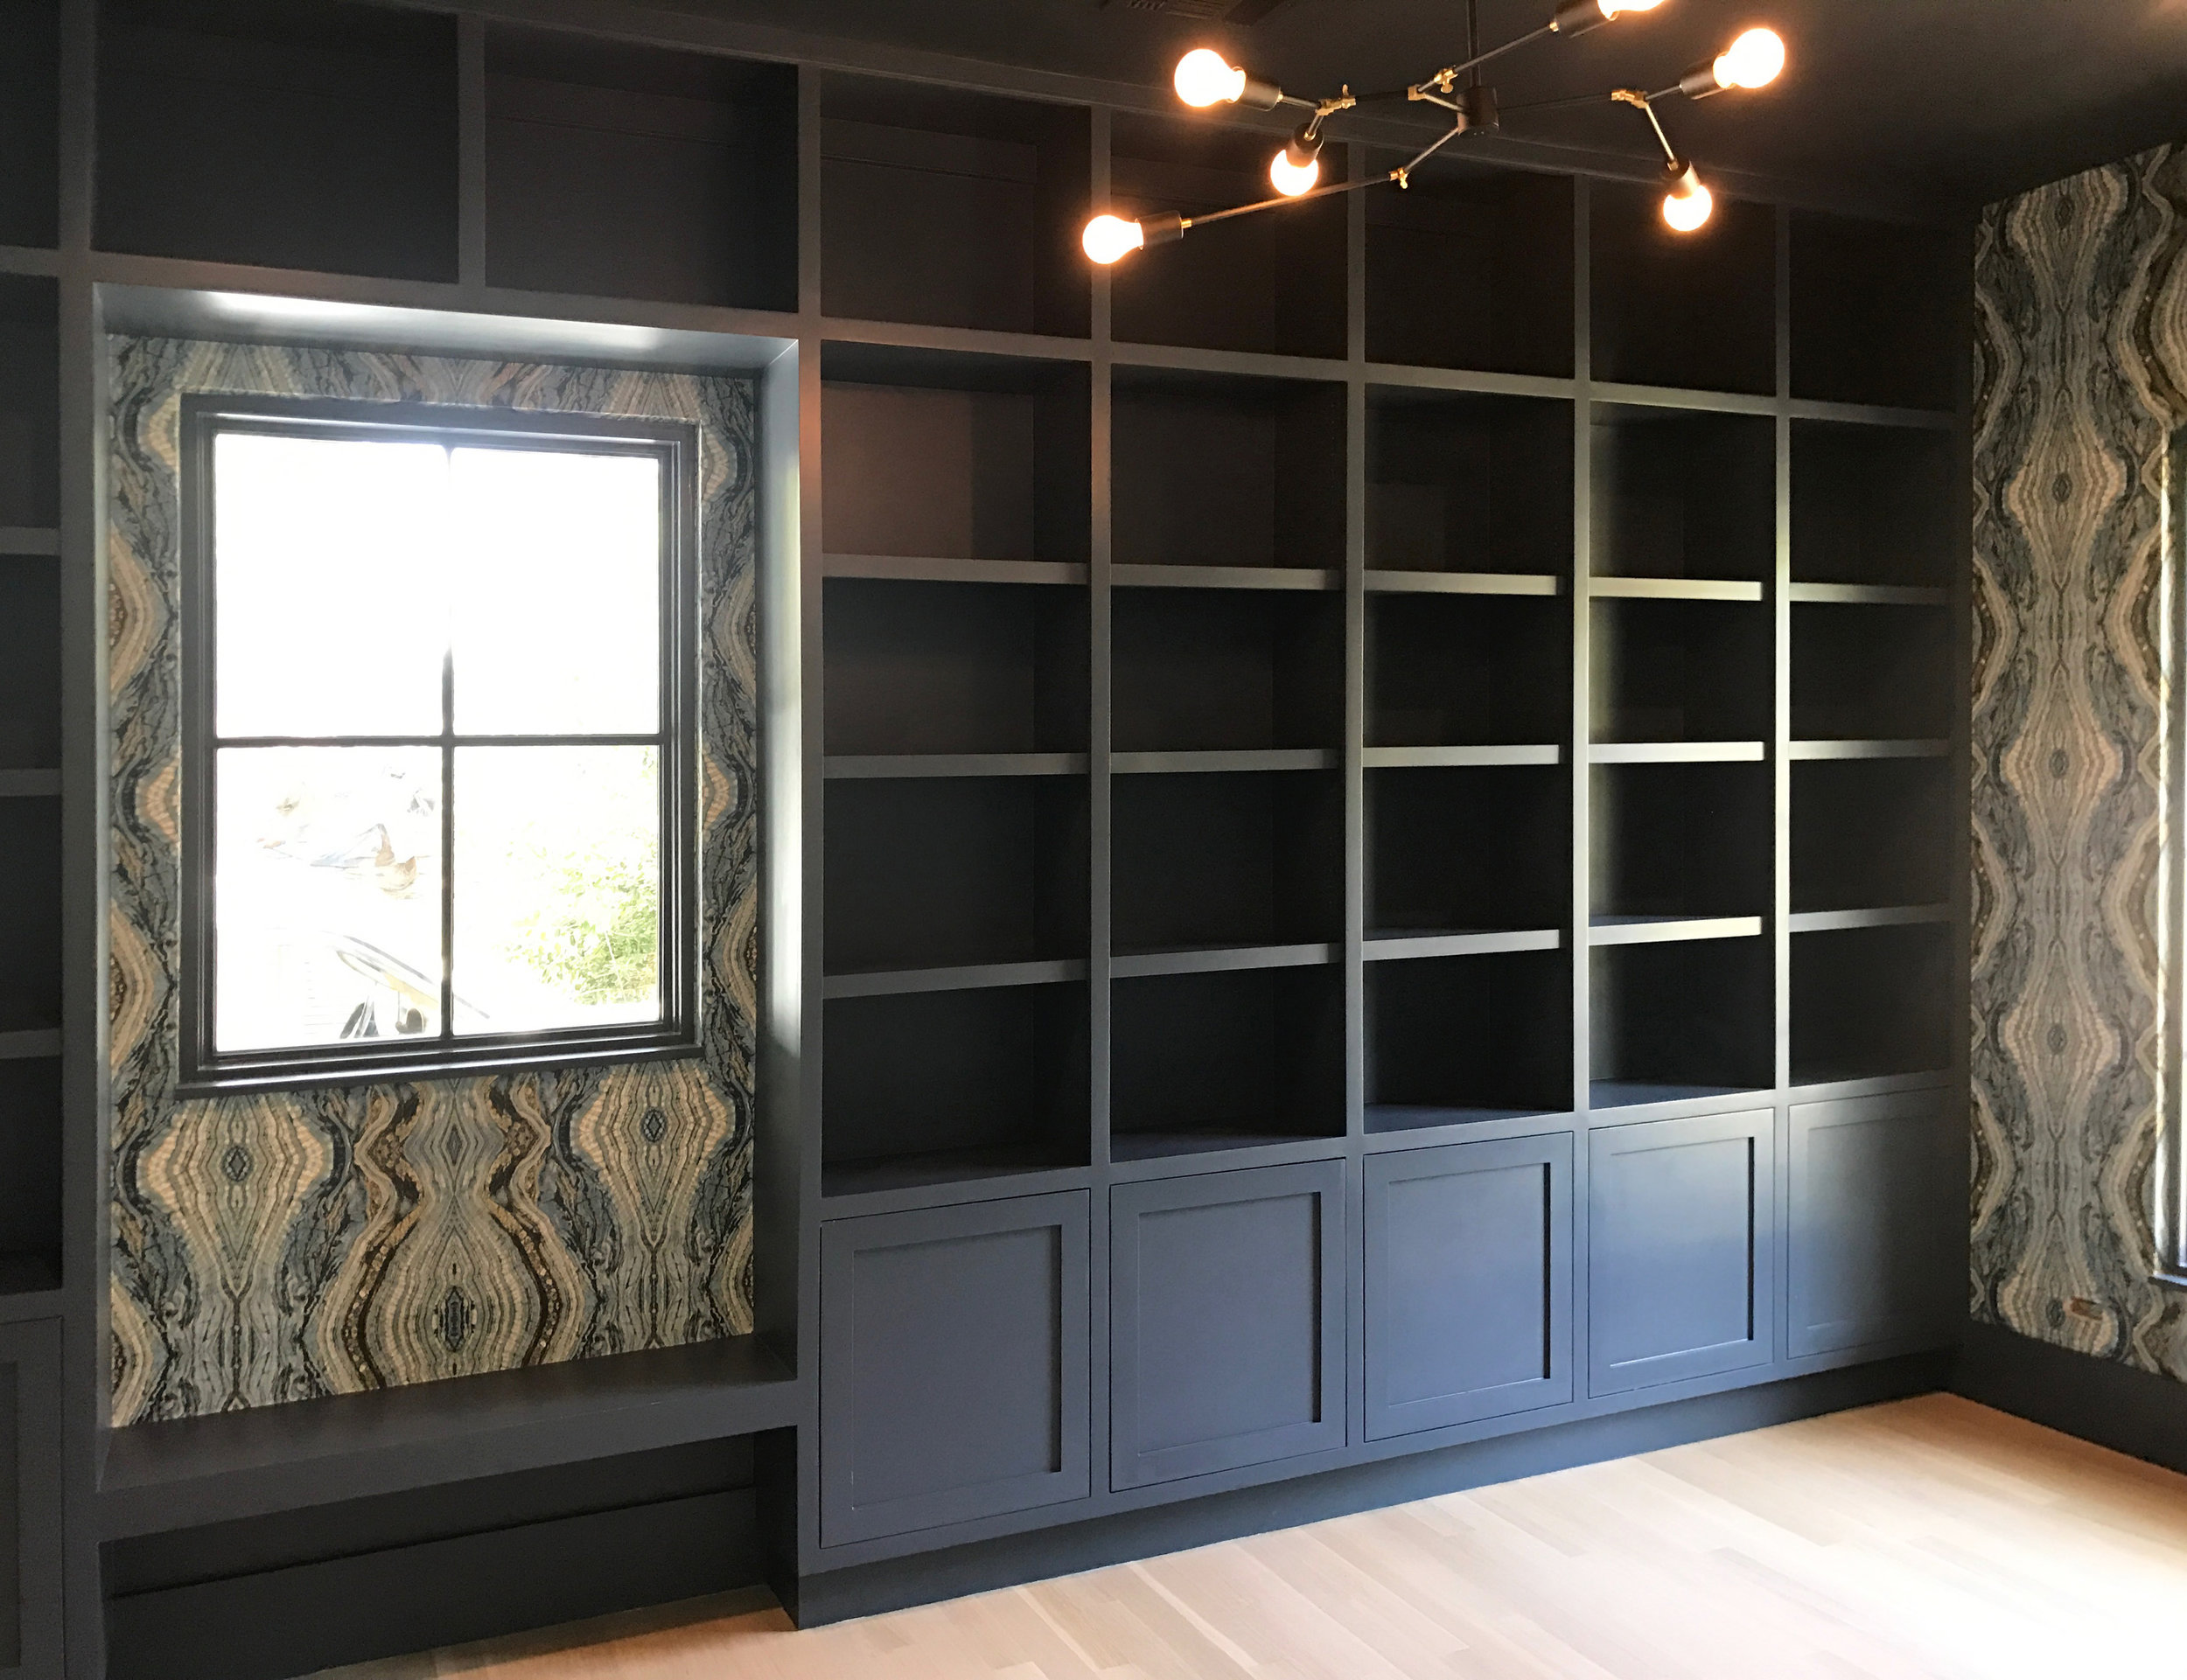 Elizabeth-Baird-Architecture-Southill Circle-shelves.jpg